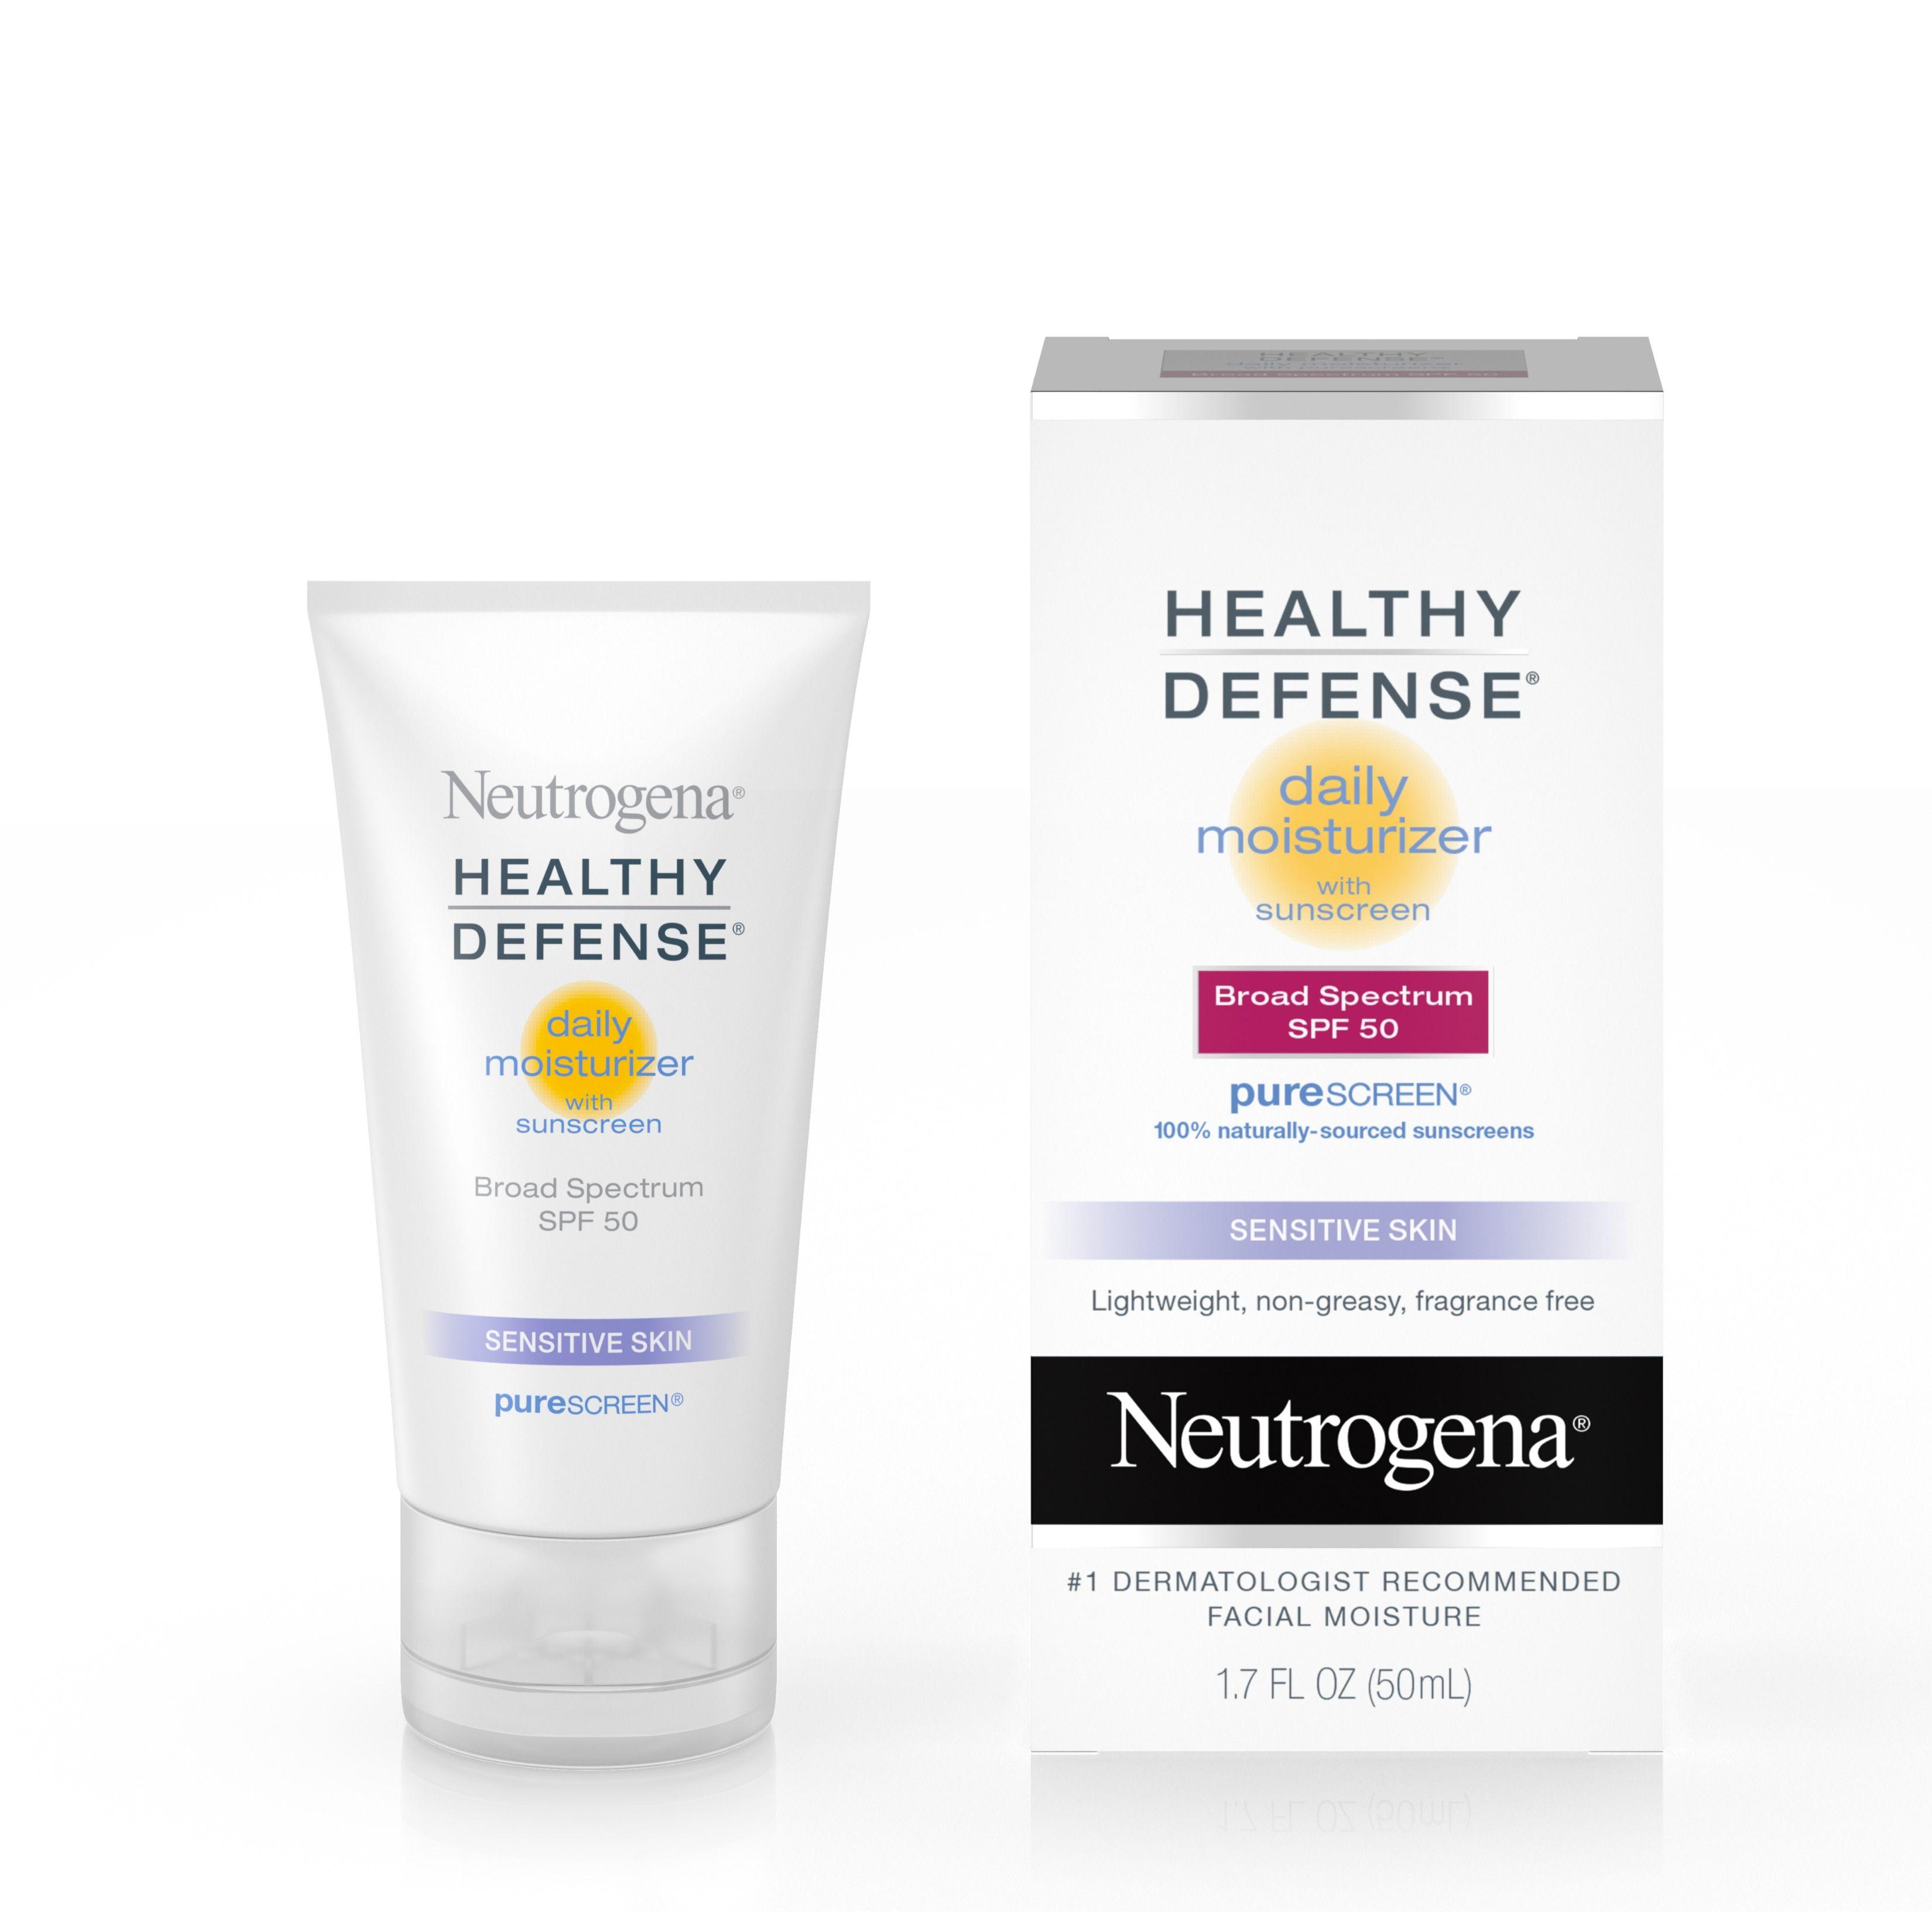 Neutrogena Healthy Defense Daily Moisturizer SPF 50